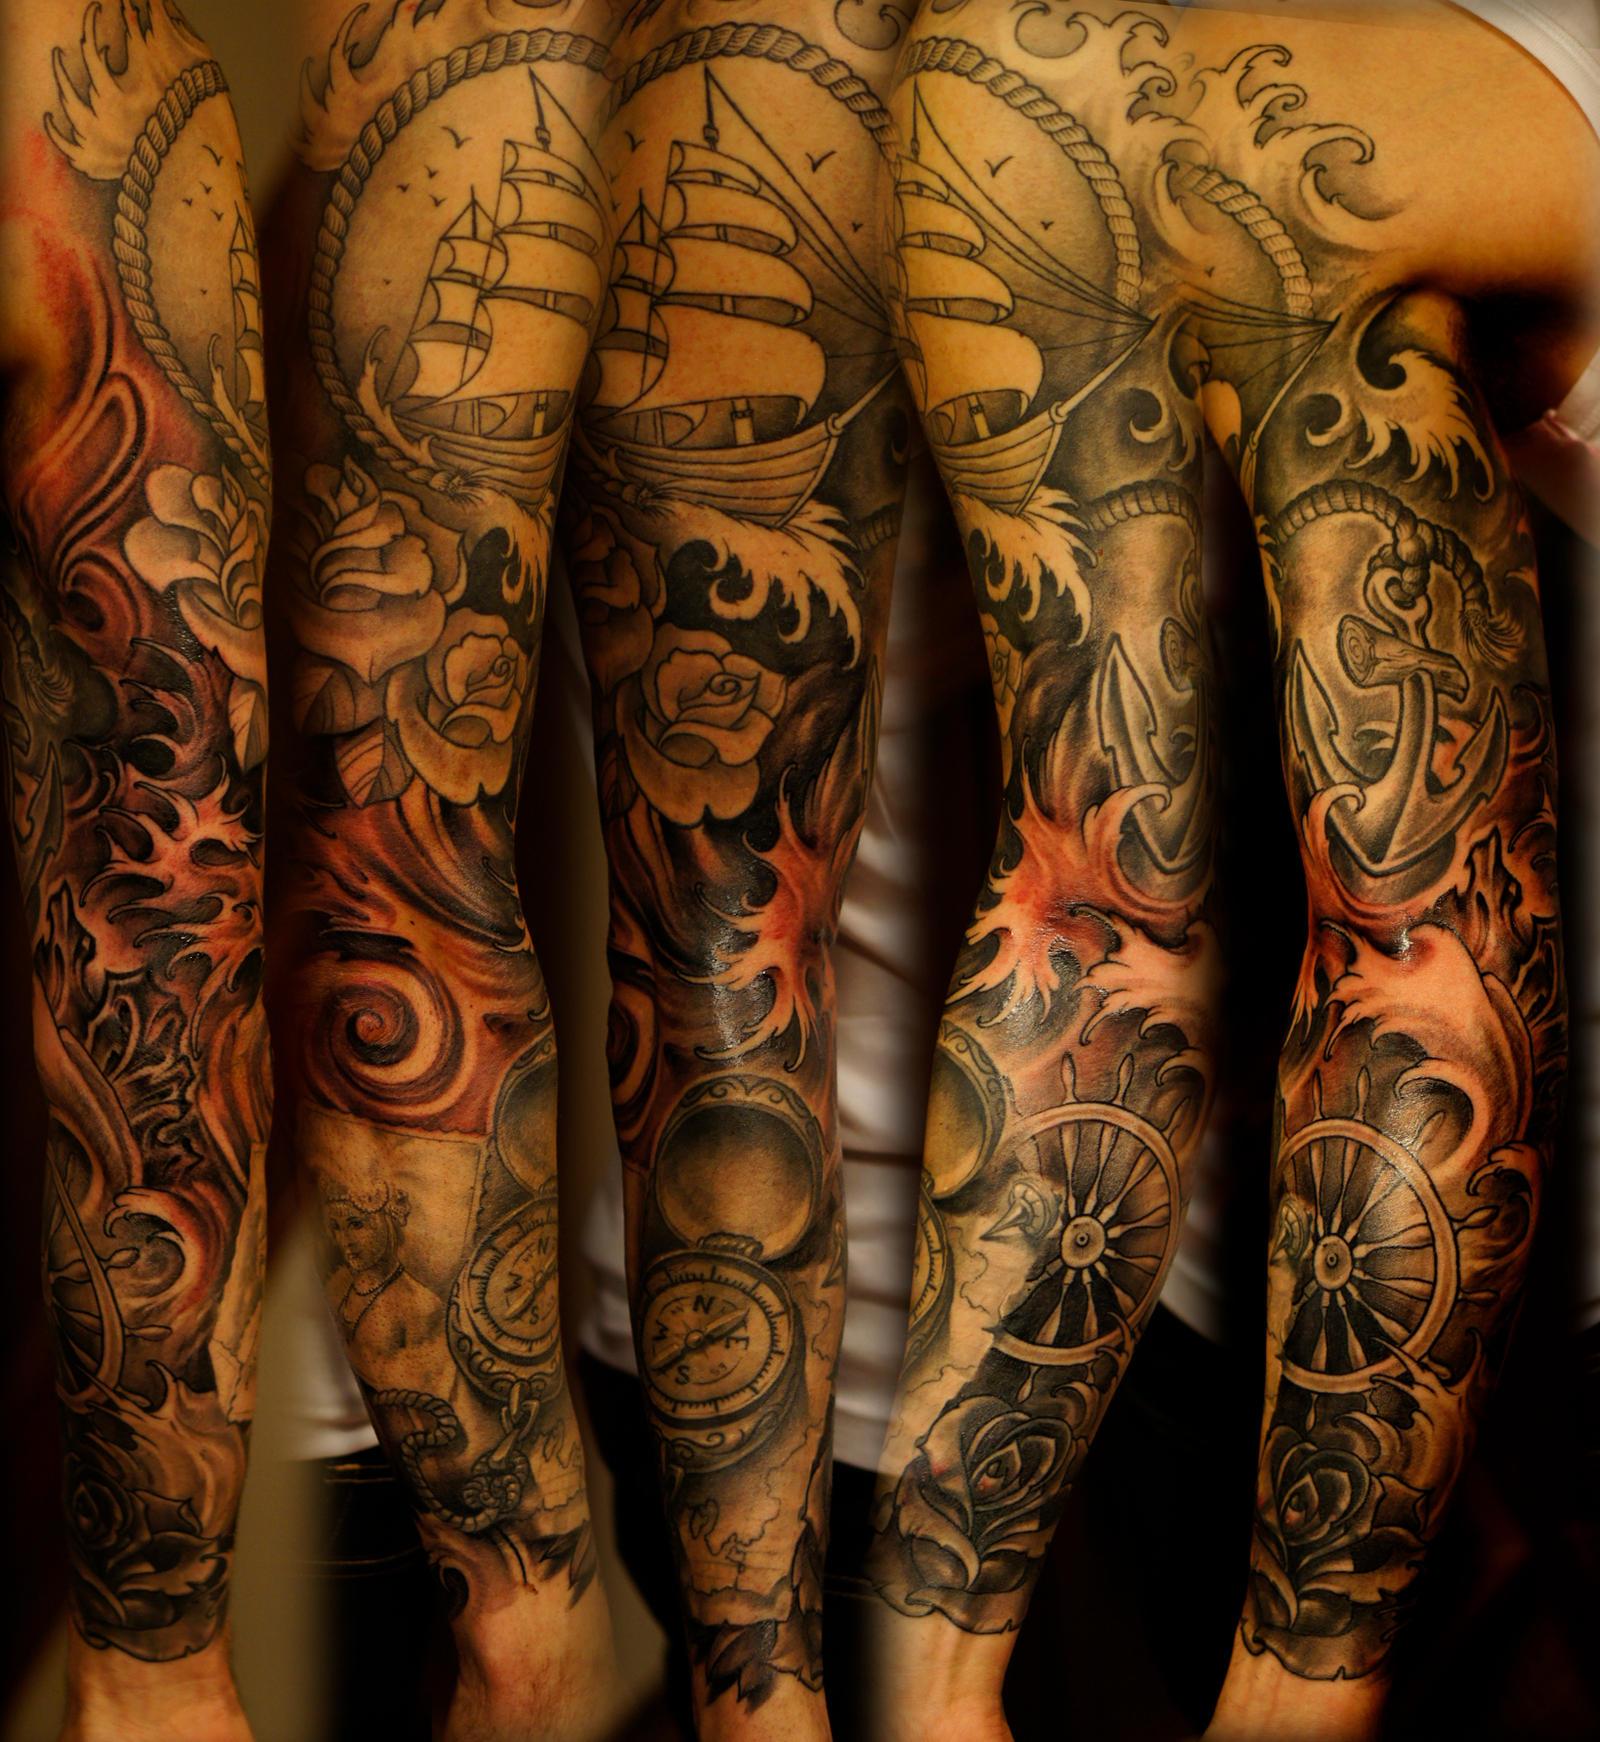 Sick Tattoo Sleeves Sea Sleeve By Strangeris Dod